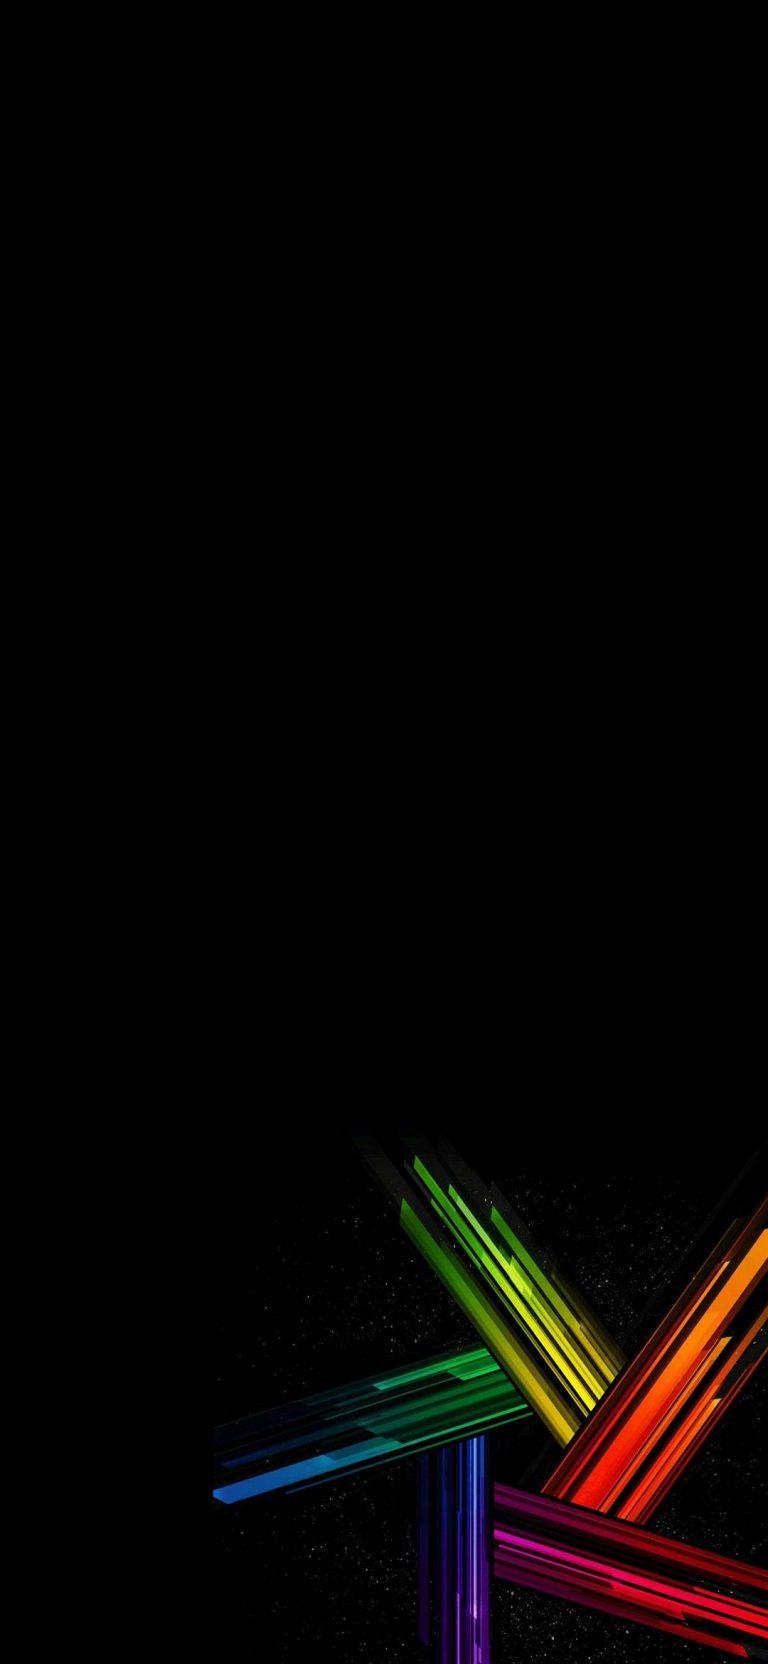 Black Phone Wallpaper 1080x2340 015 768x1664